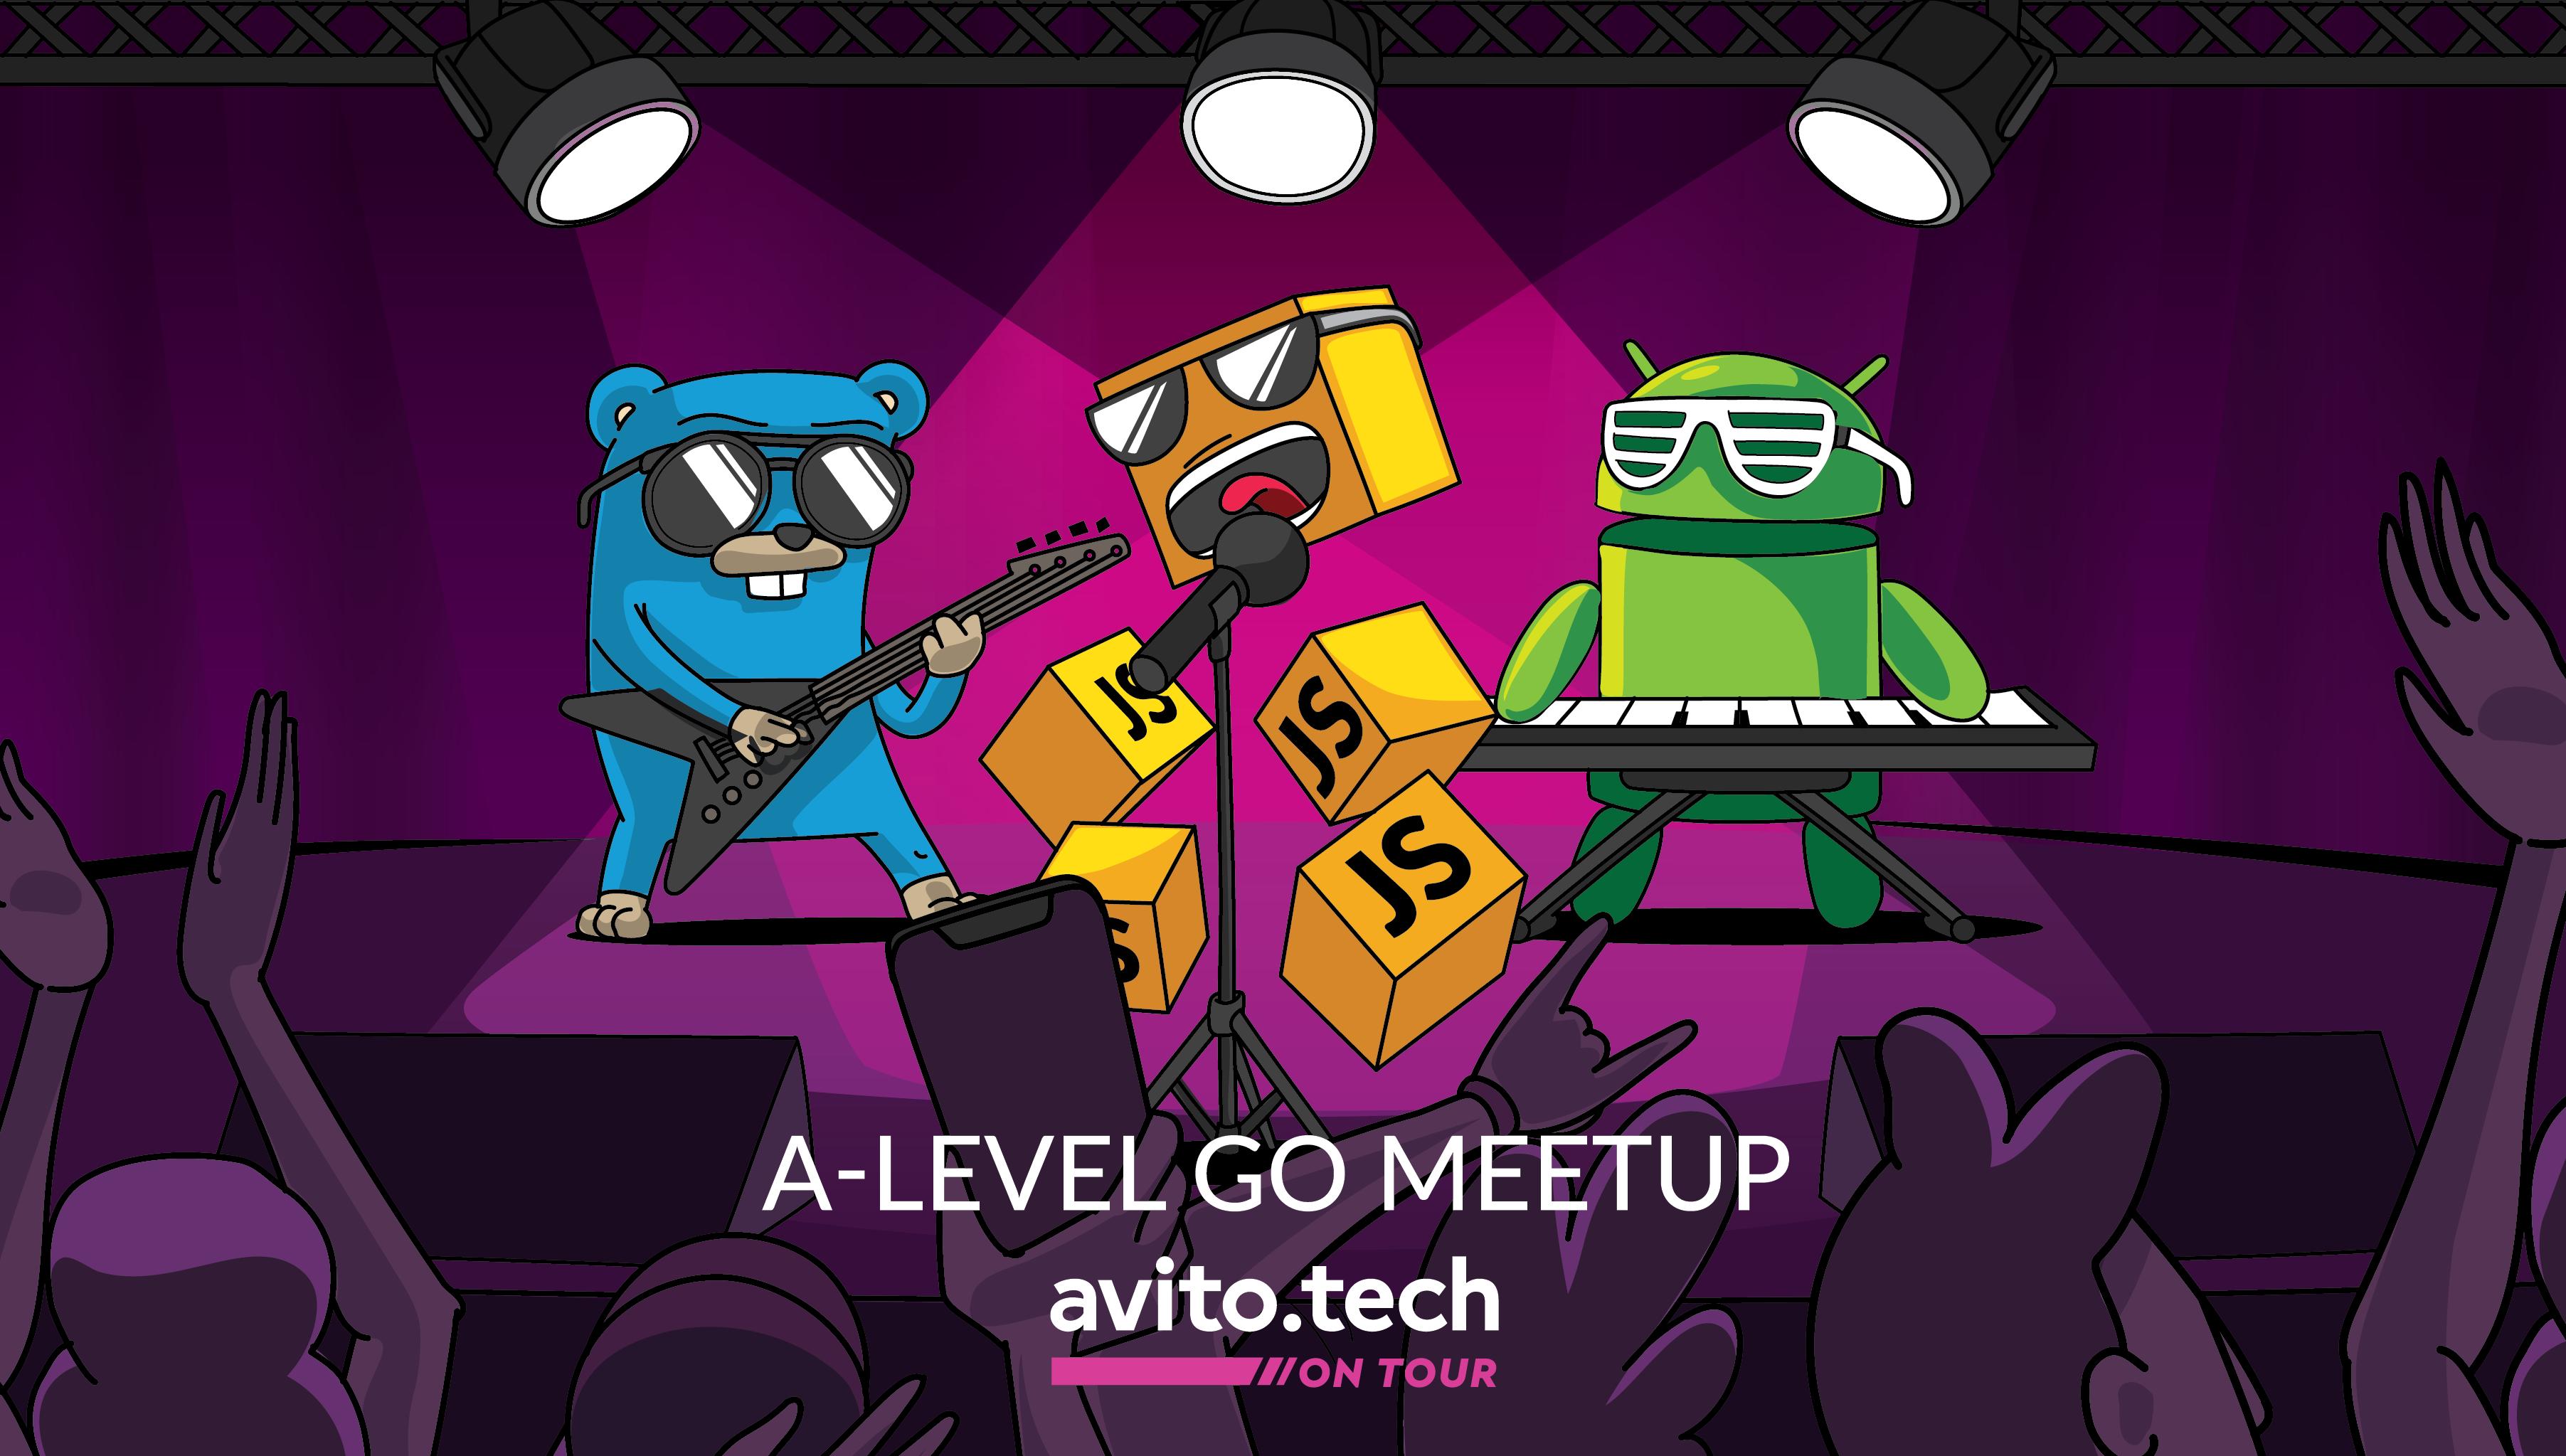 A-level Go meetup